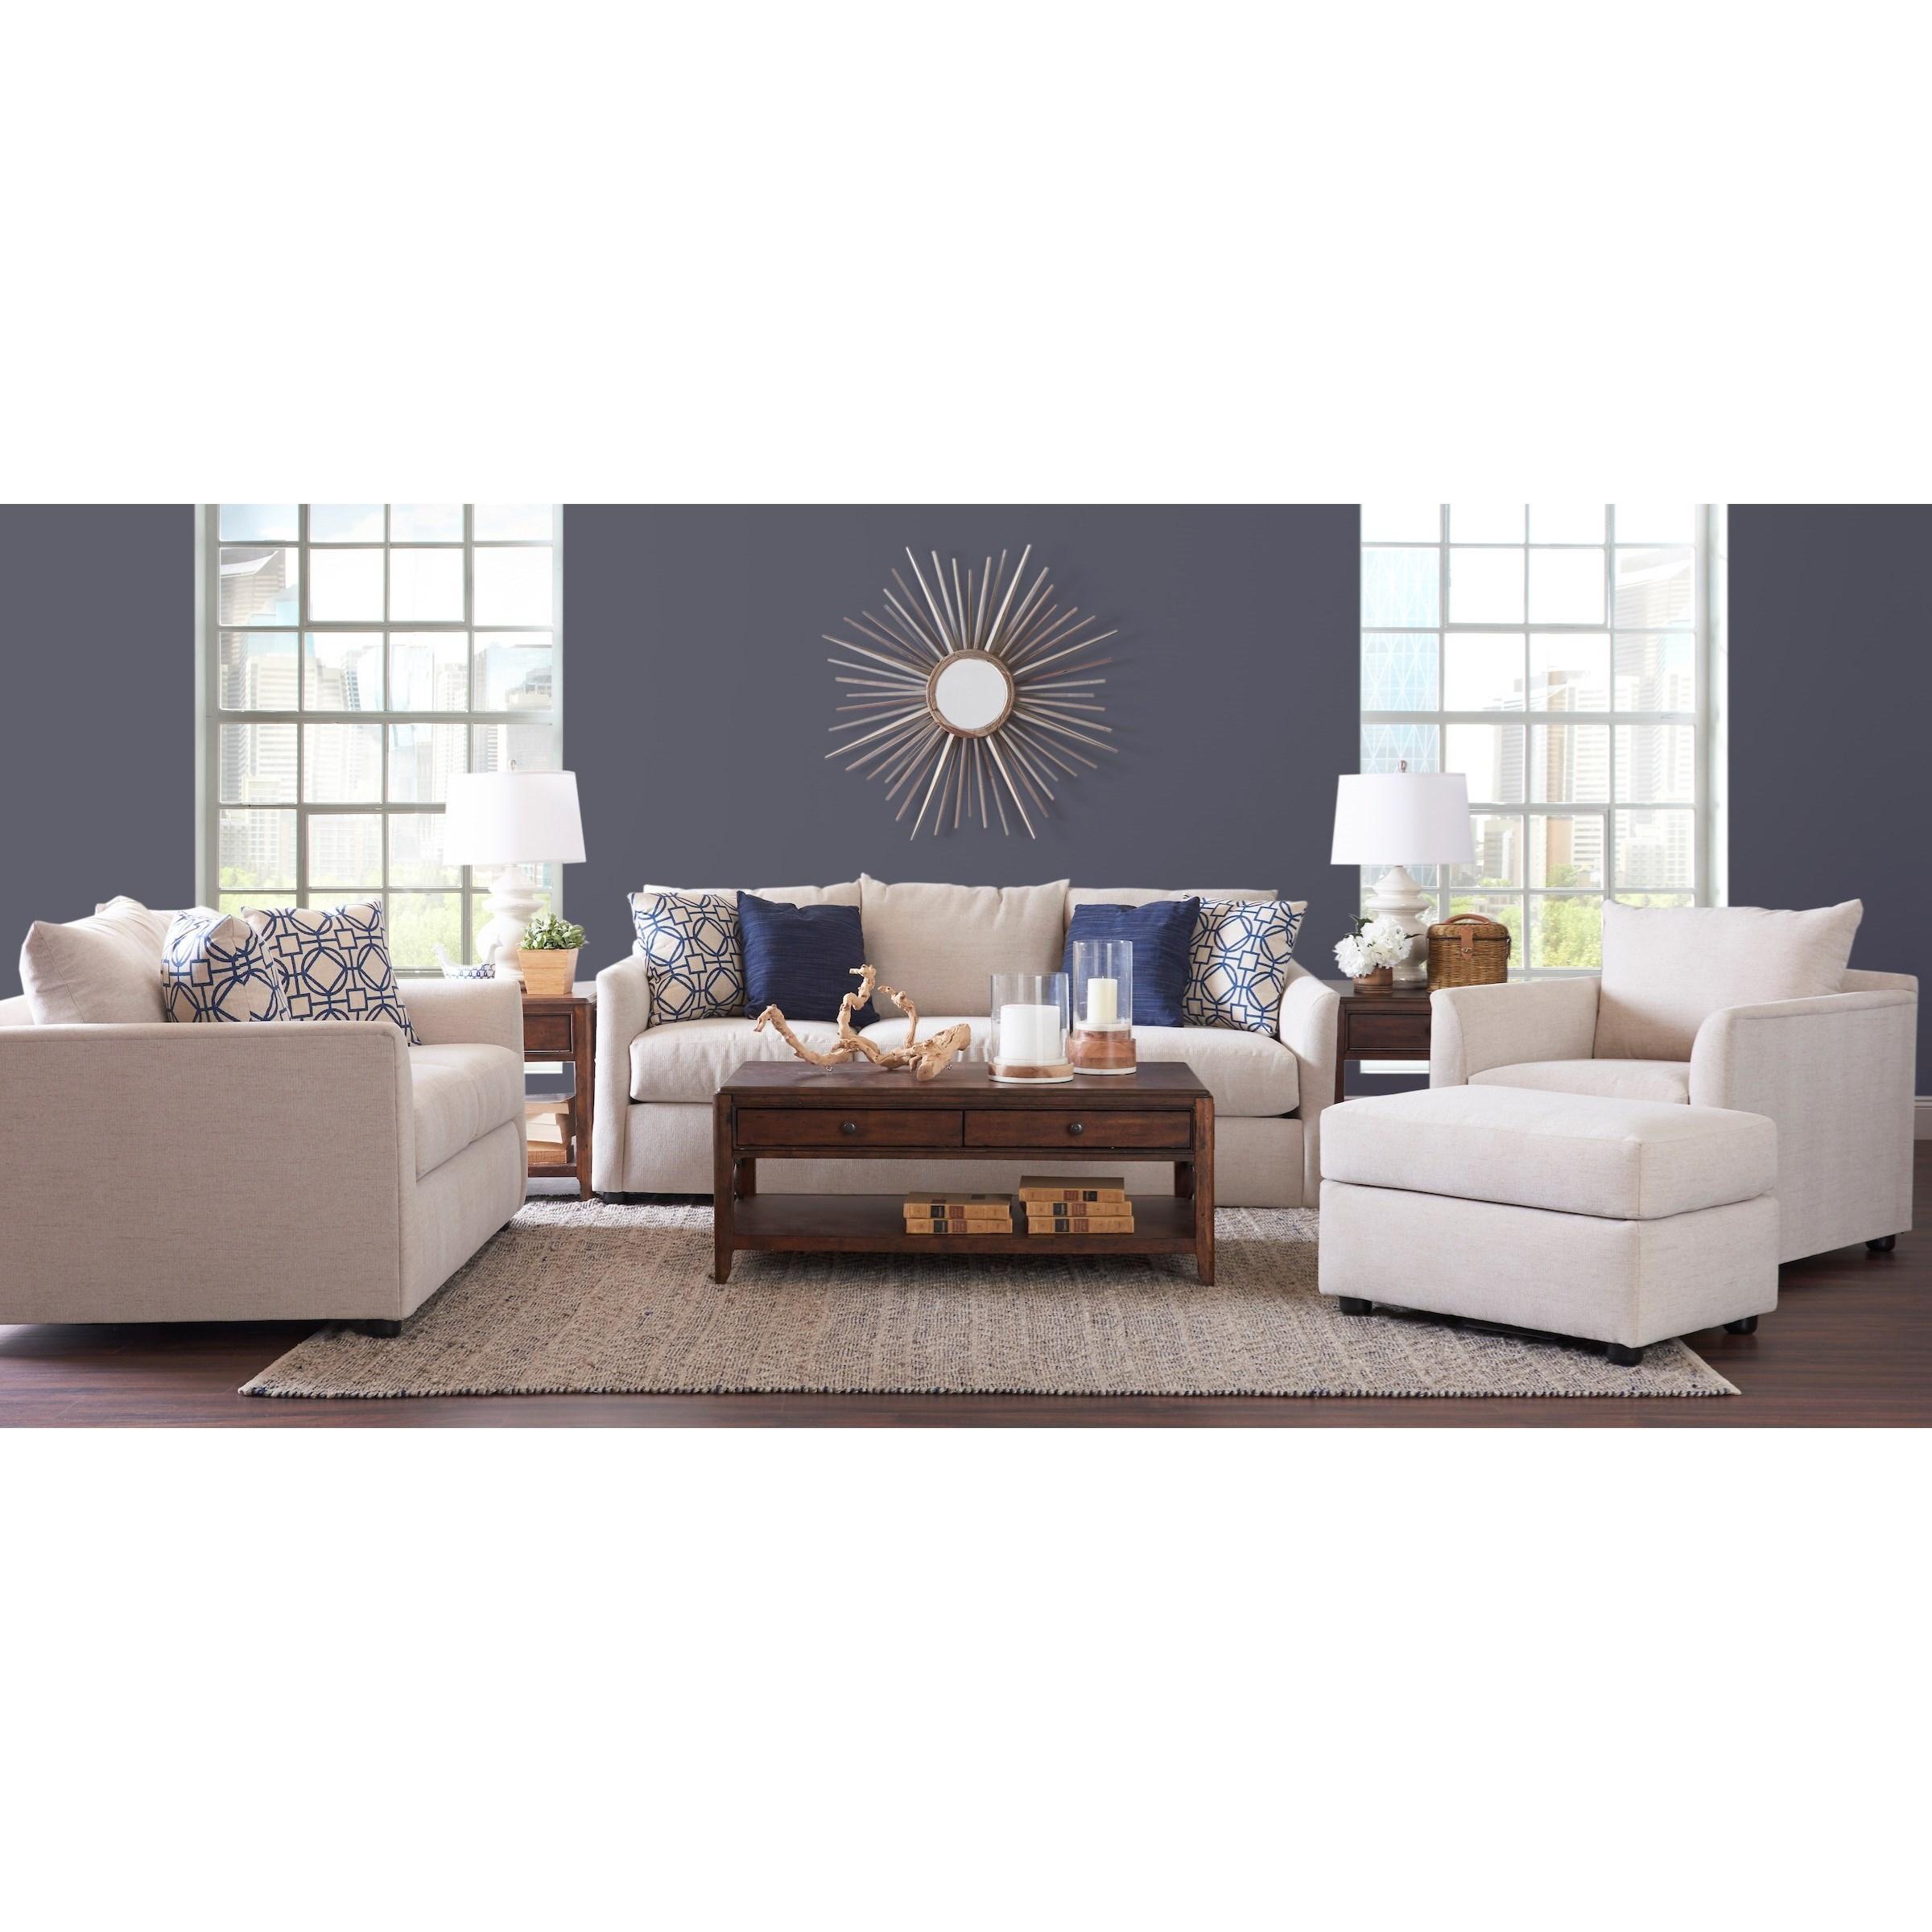 Atlanta Living Room Group by Klaussner at Johnny Janosik